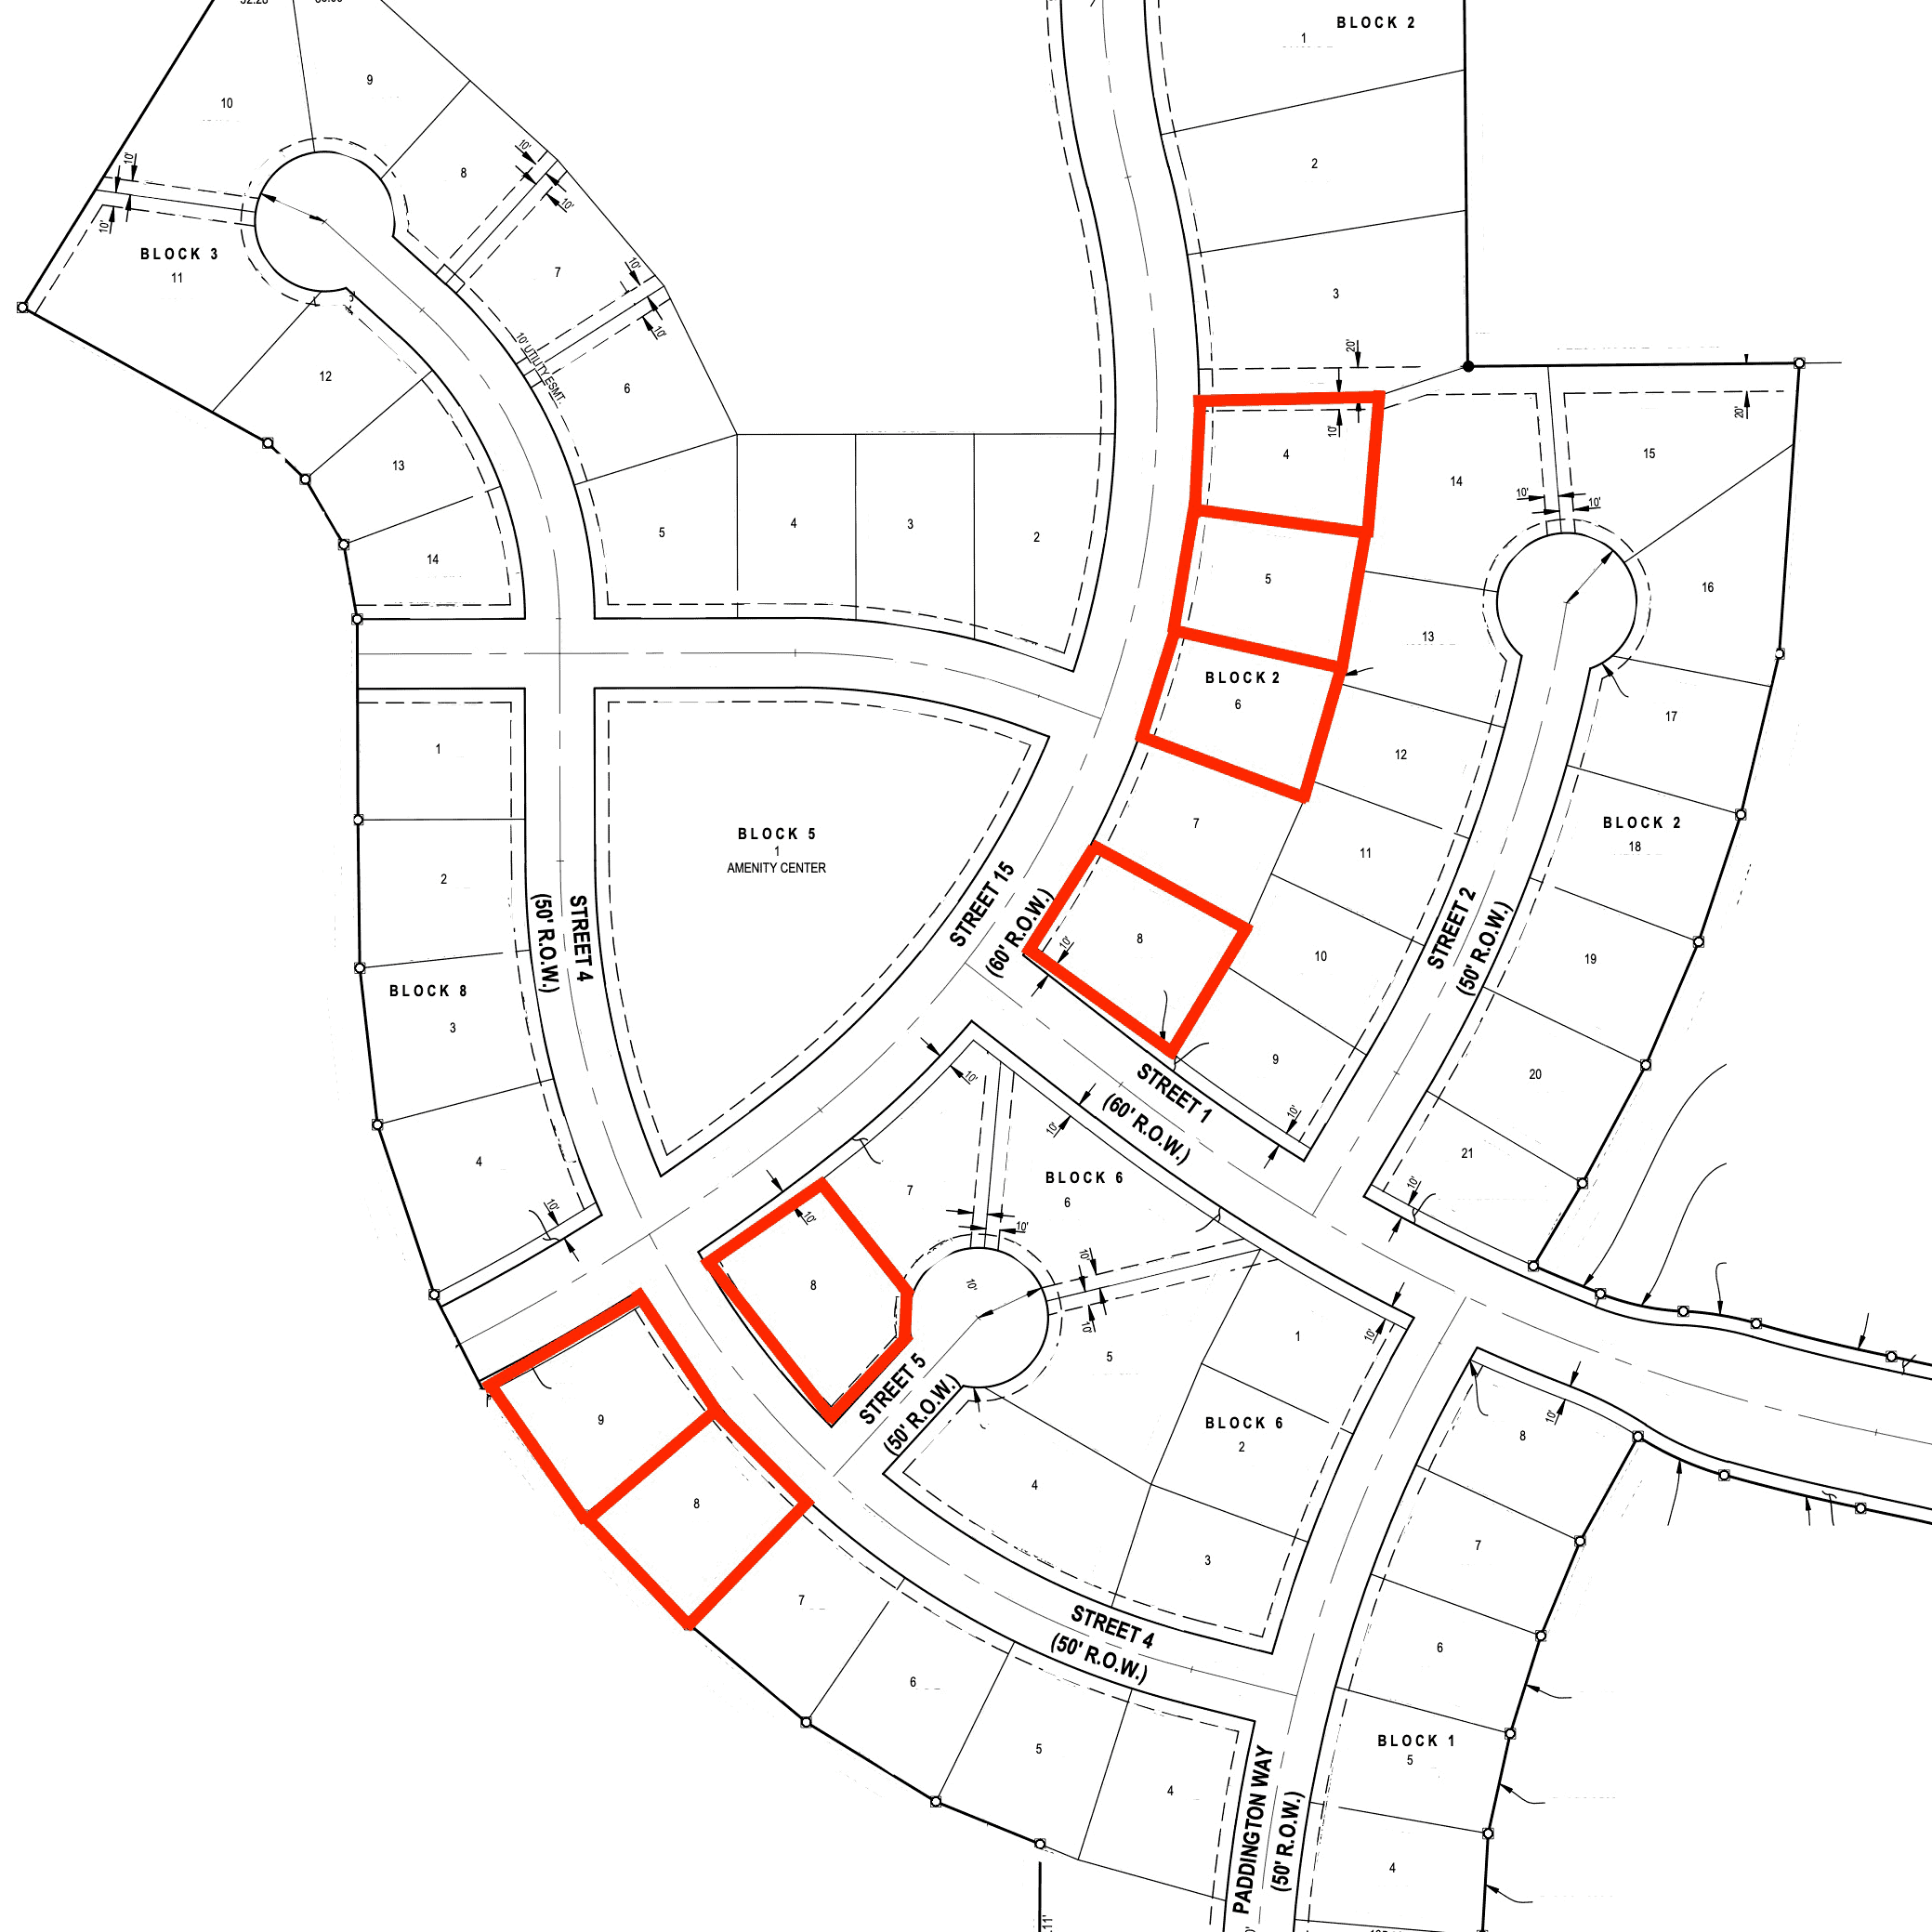 BAM-Builders-Callan-Village-Ph-1A-Plat-Square